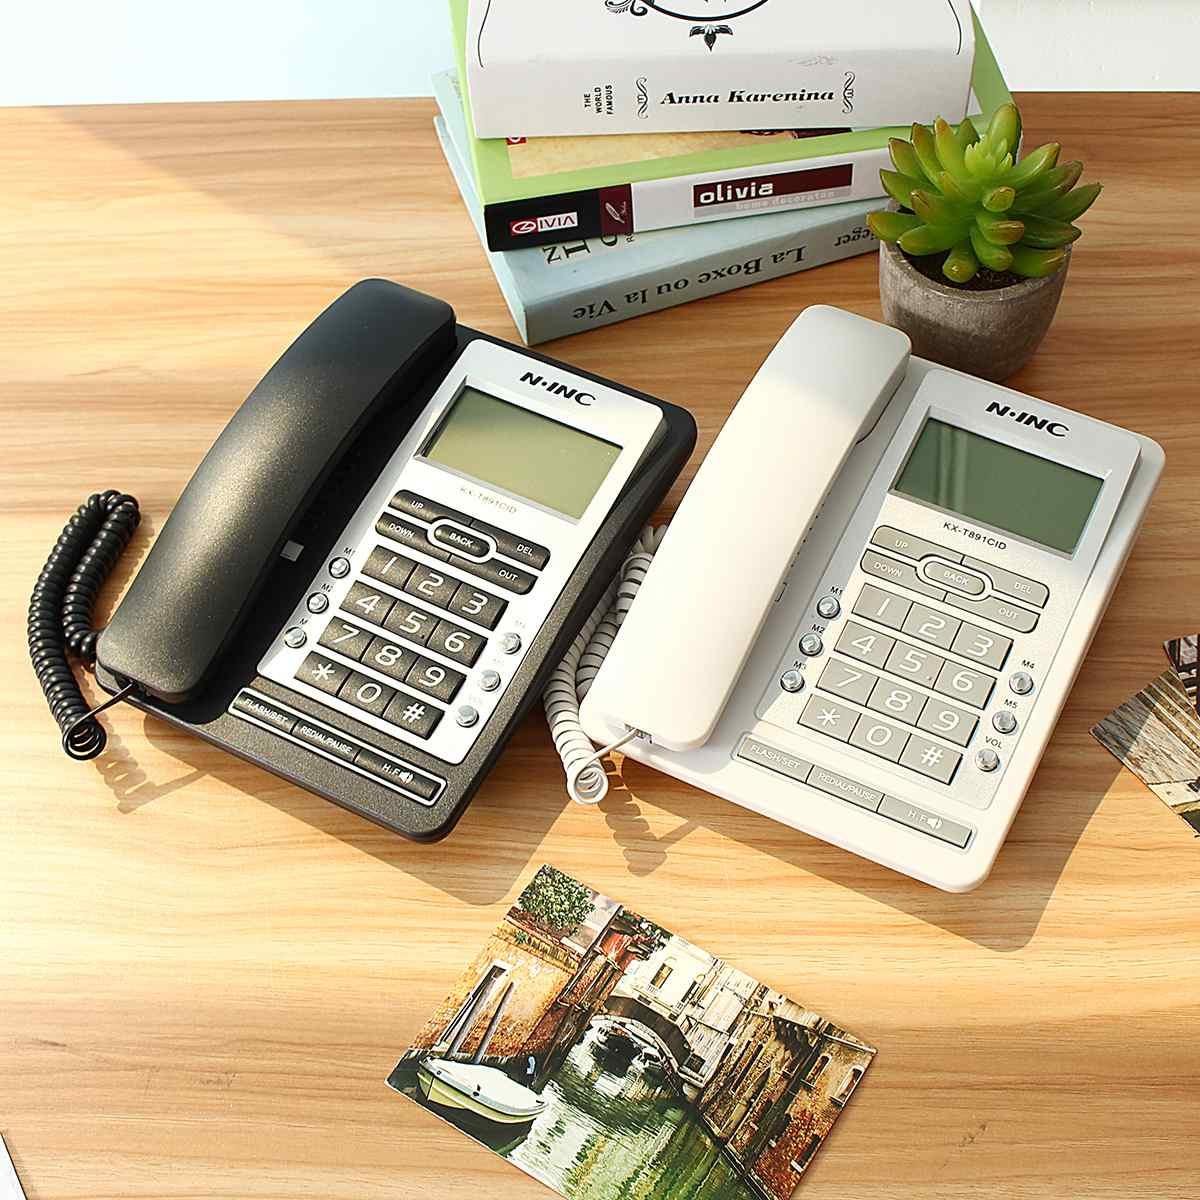 Fixed Phone Desk Phone Telephone LCD Screen Desktop Antenna Interface Incoming Call Display